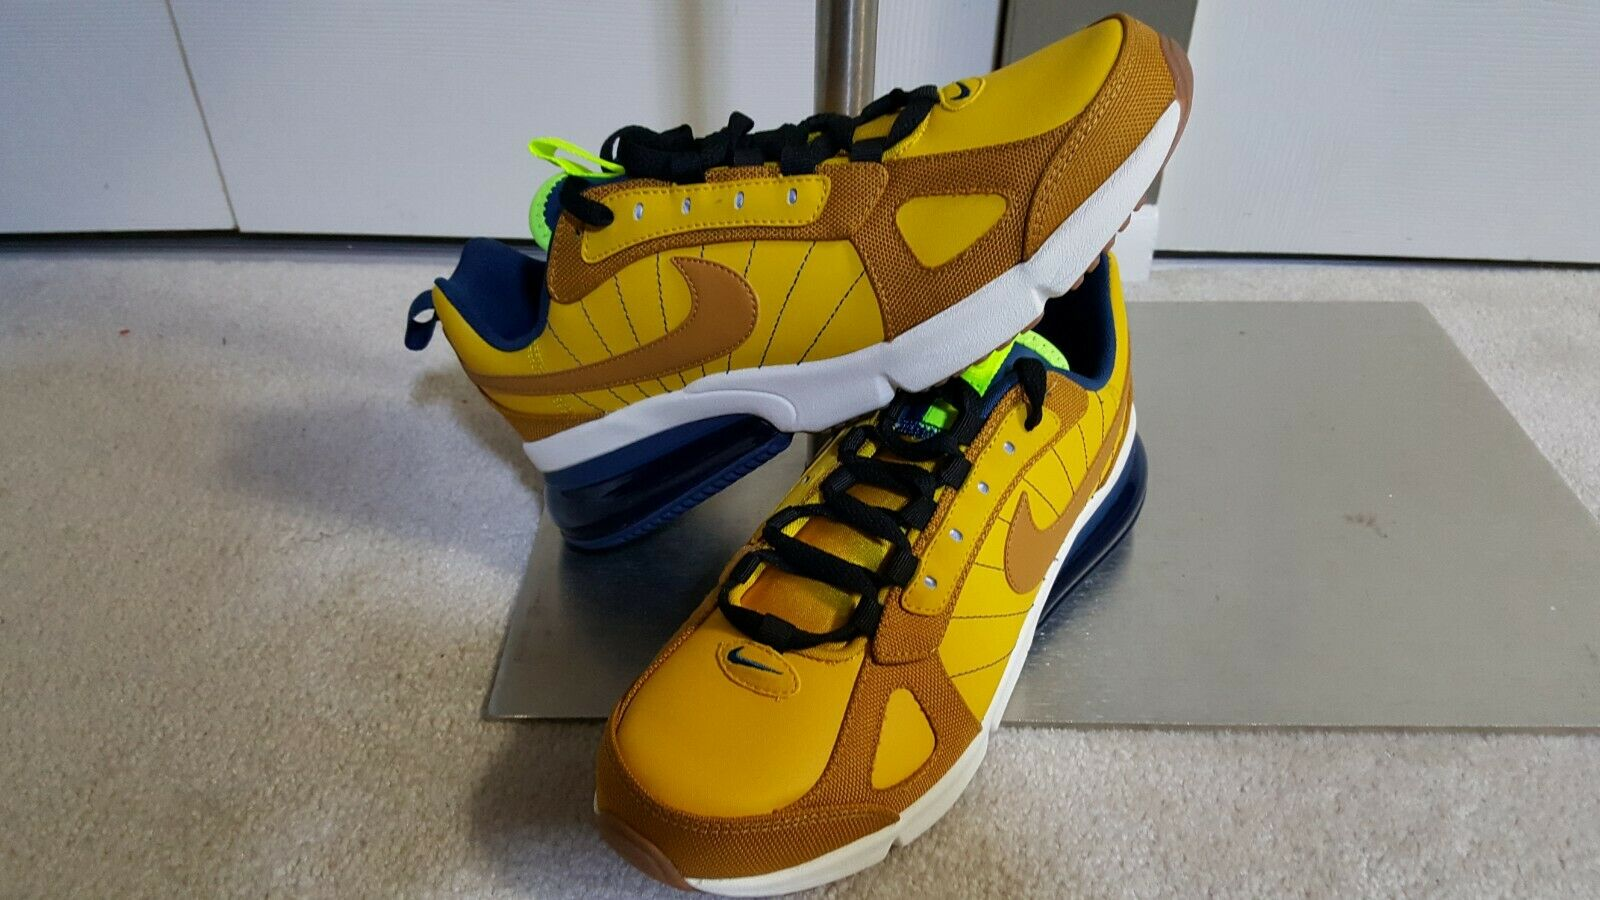 Neu Nike Herren Air Max 270 Futura Textil Turnschuhe Größe 9